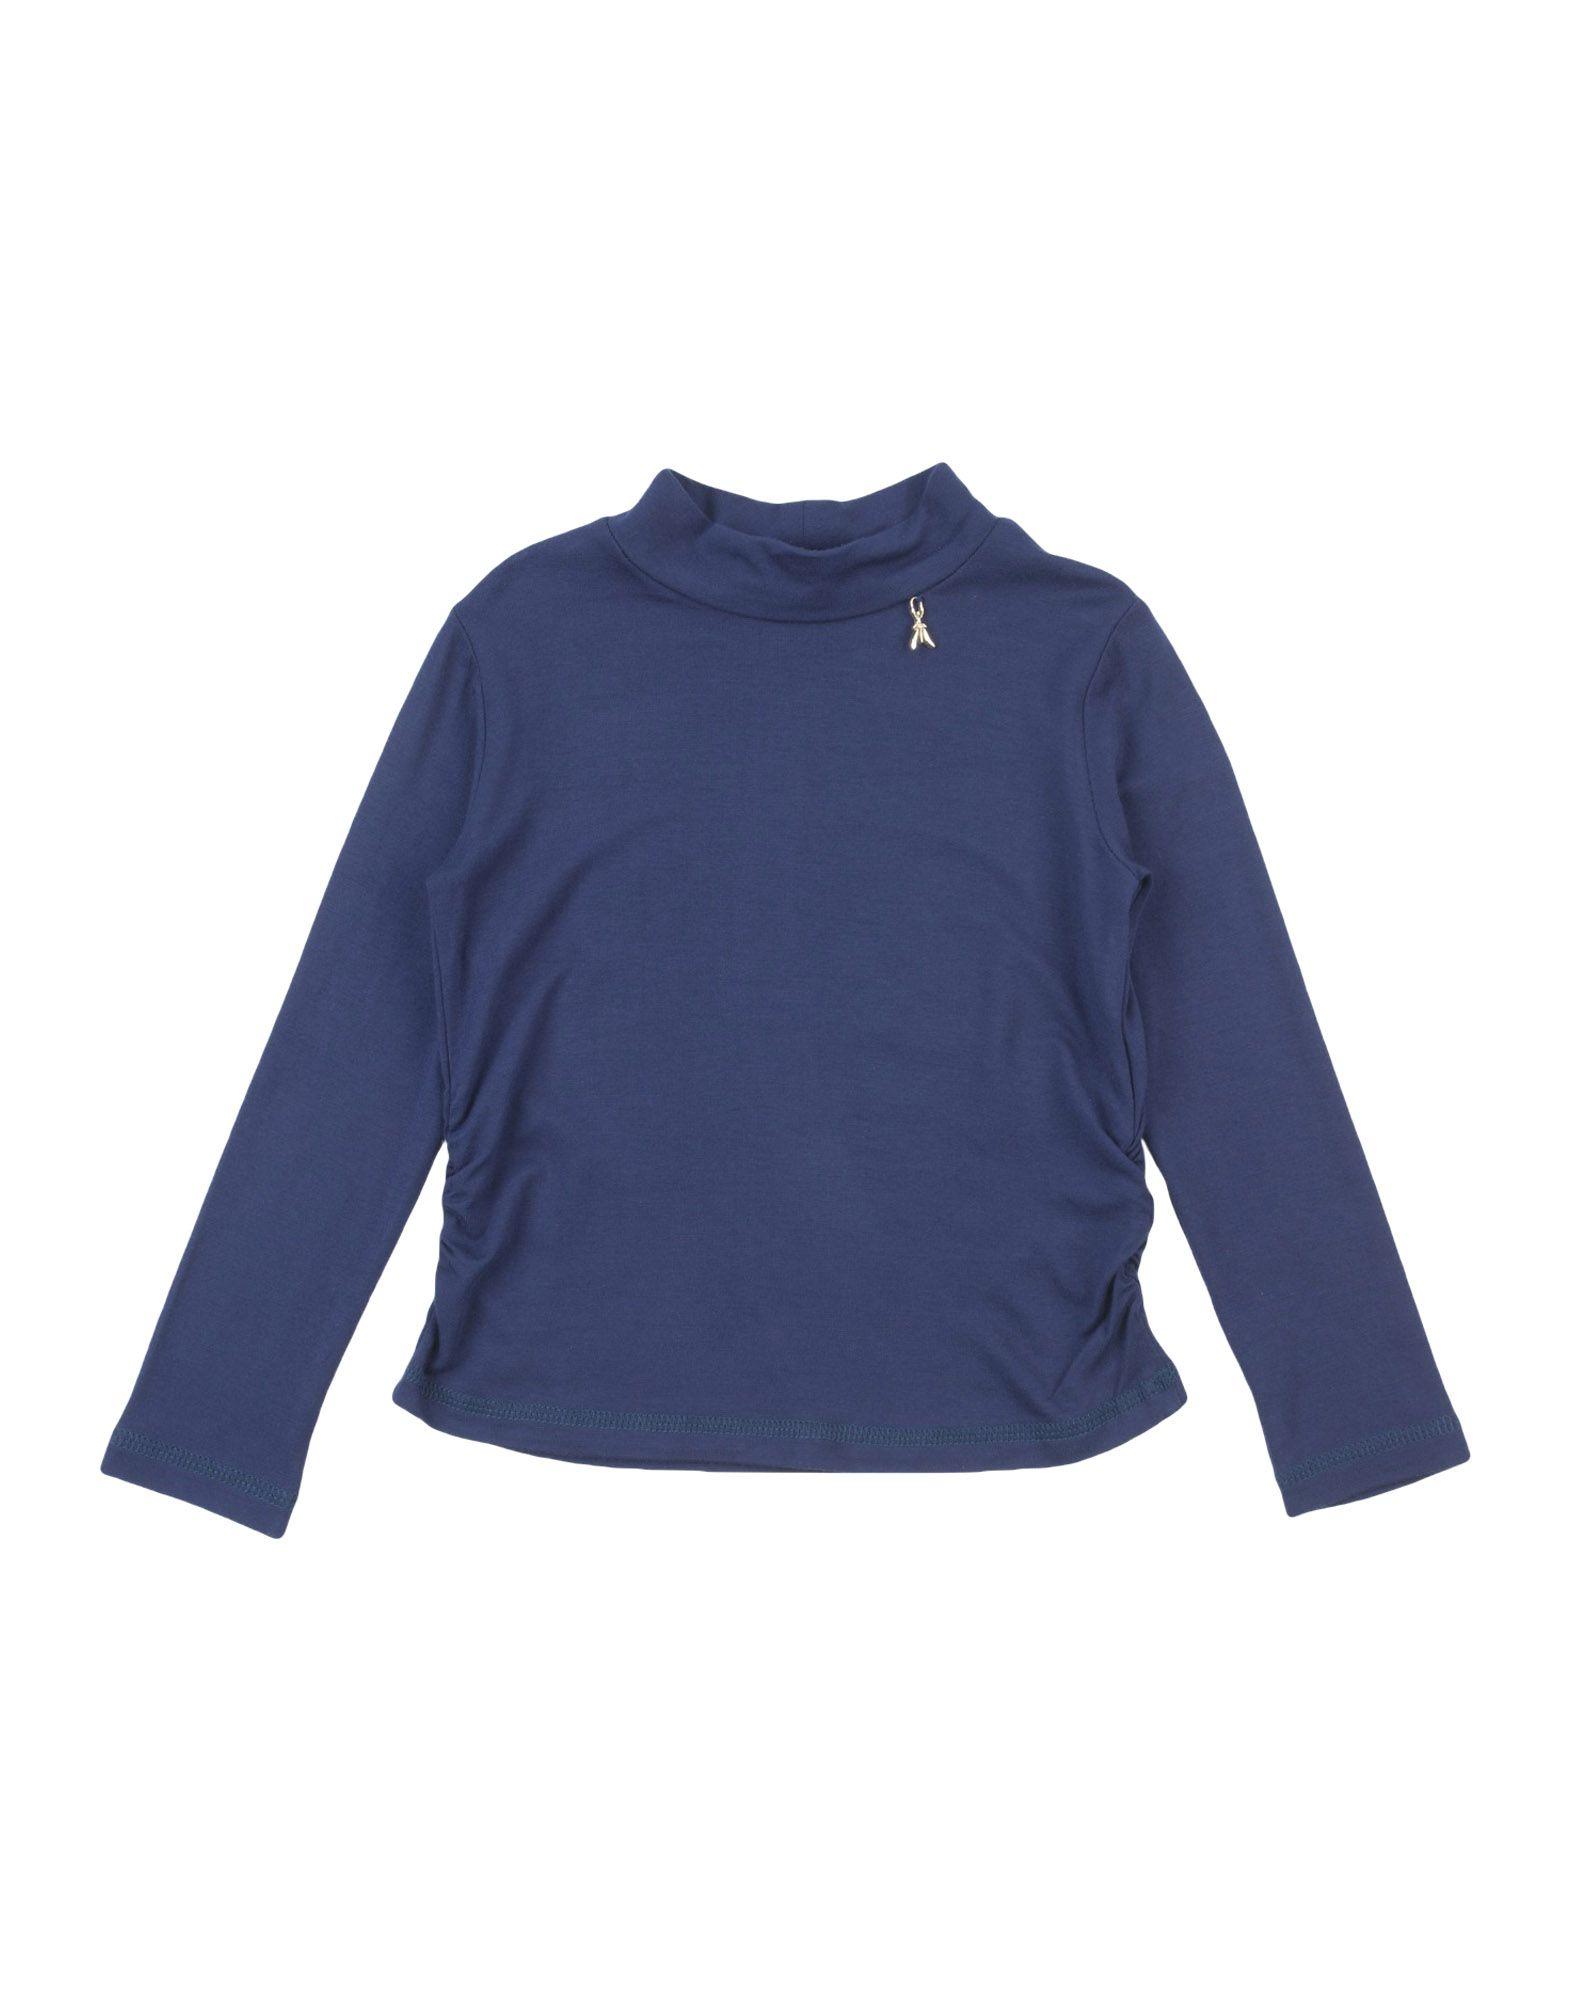 Patrizia Pepe Kids' T-shirts In Blue